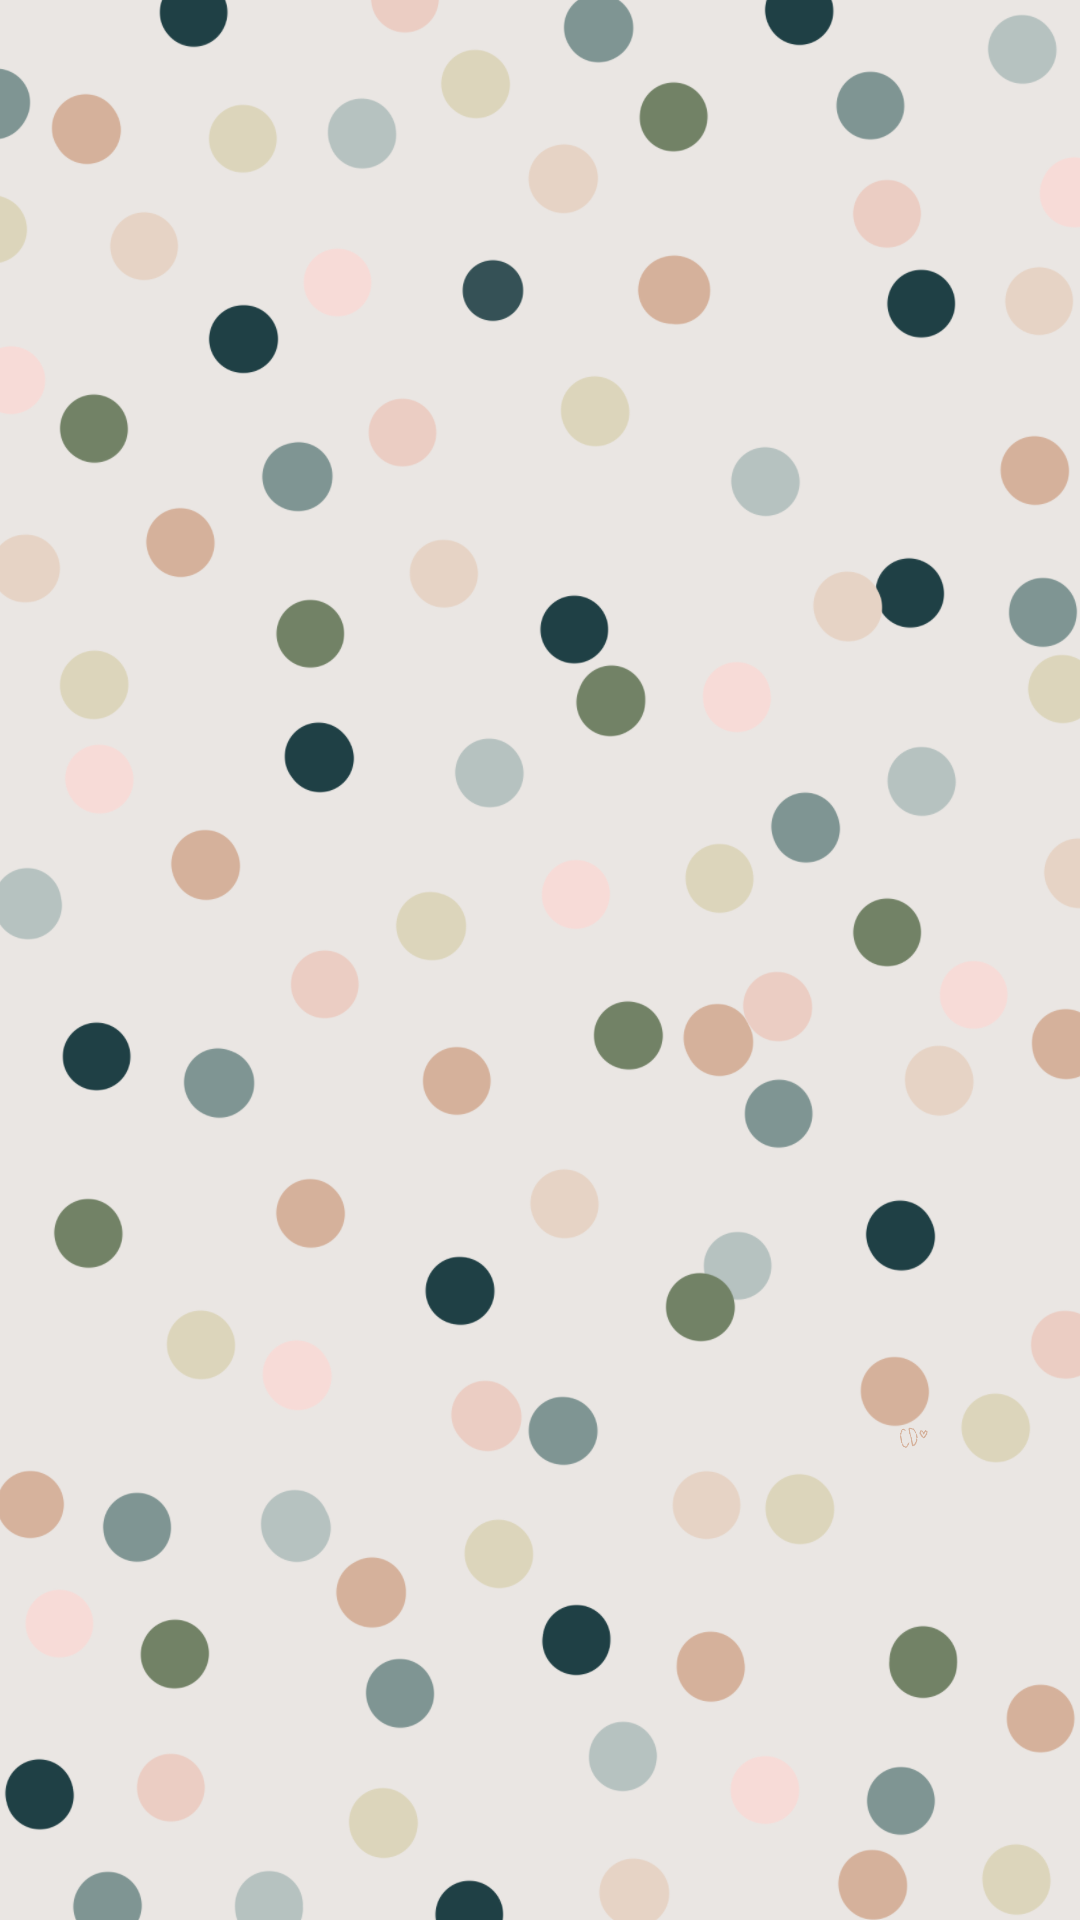 Callie Danielle Phone Wallpaper Iphone Background Wallpaper Cute Patterns Wallpaper Aesthetic Iphone Wallpaper